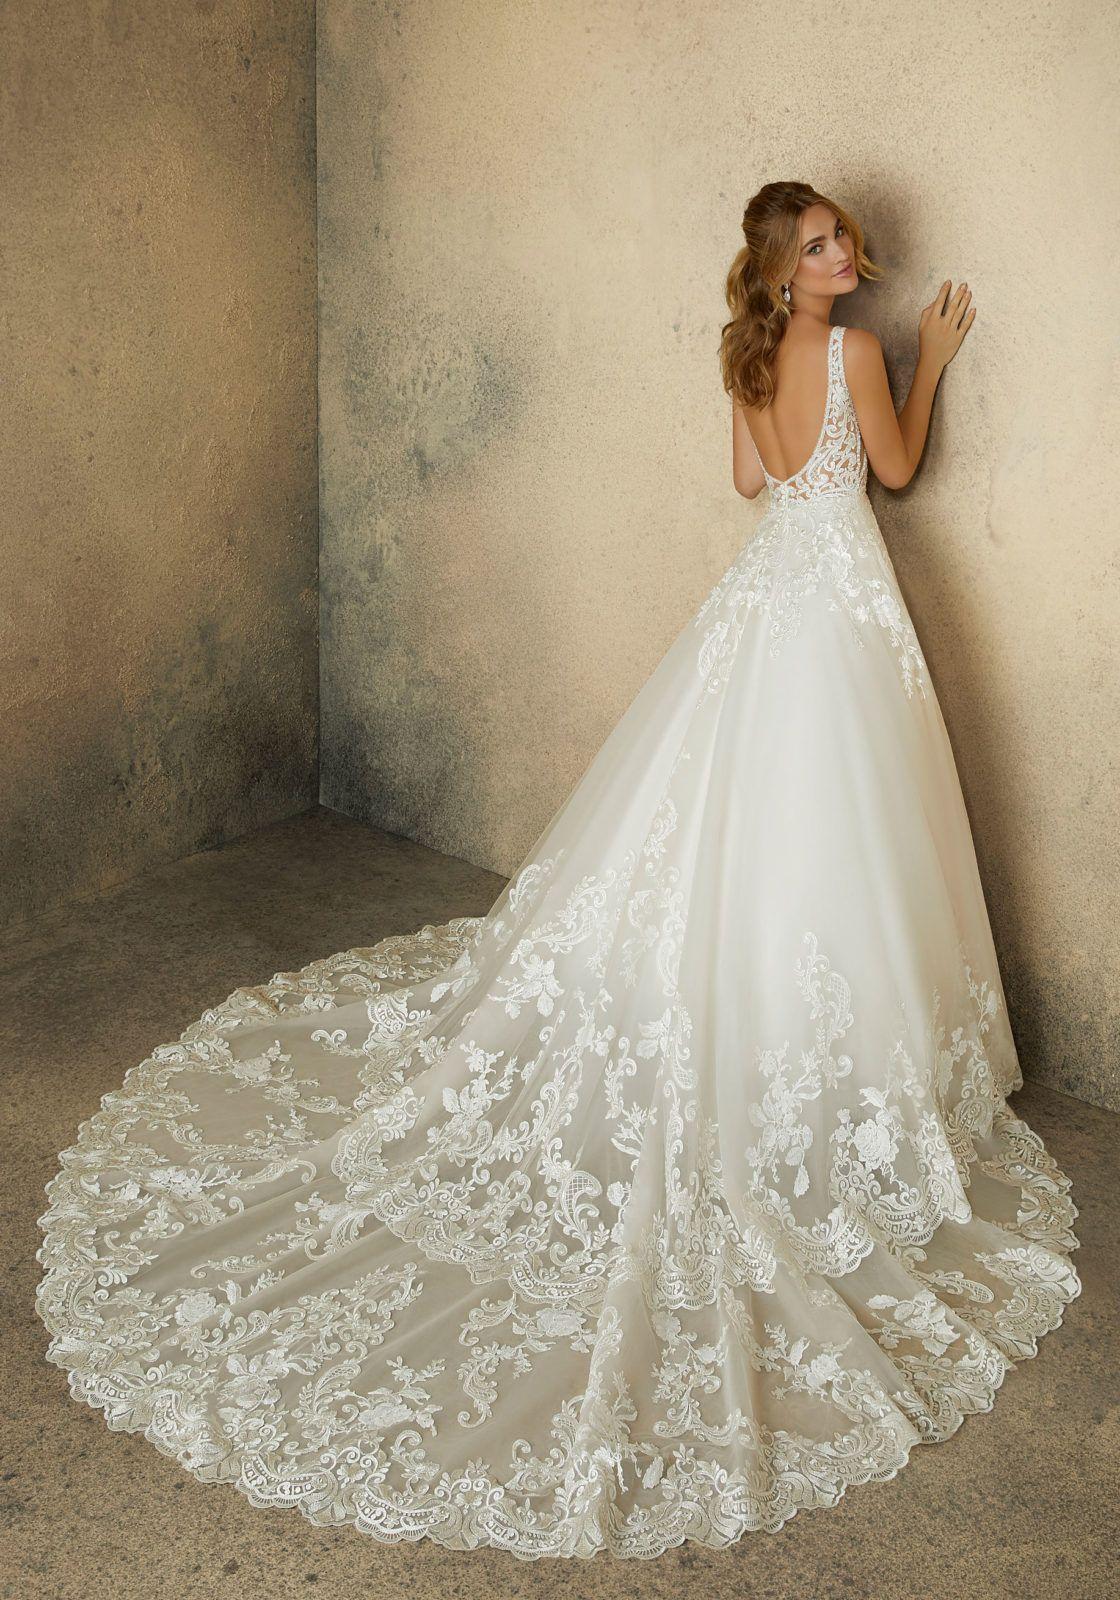 Robin Wedding Dress Morilee Mori Lee Wedding Dress Short Wedding Dress Ball Gown Wedding Dress,Designer Plus Size Wedding Guest Dresses